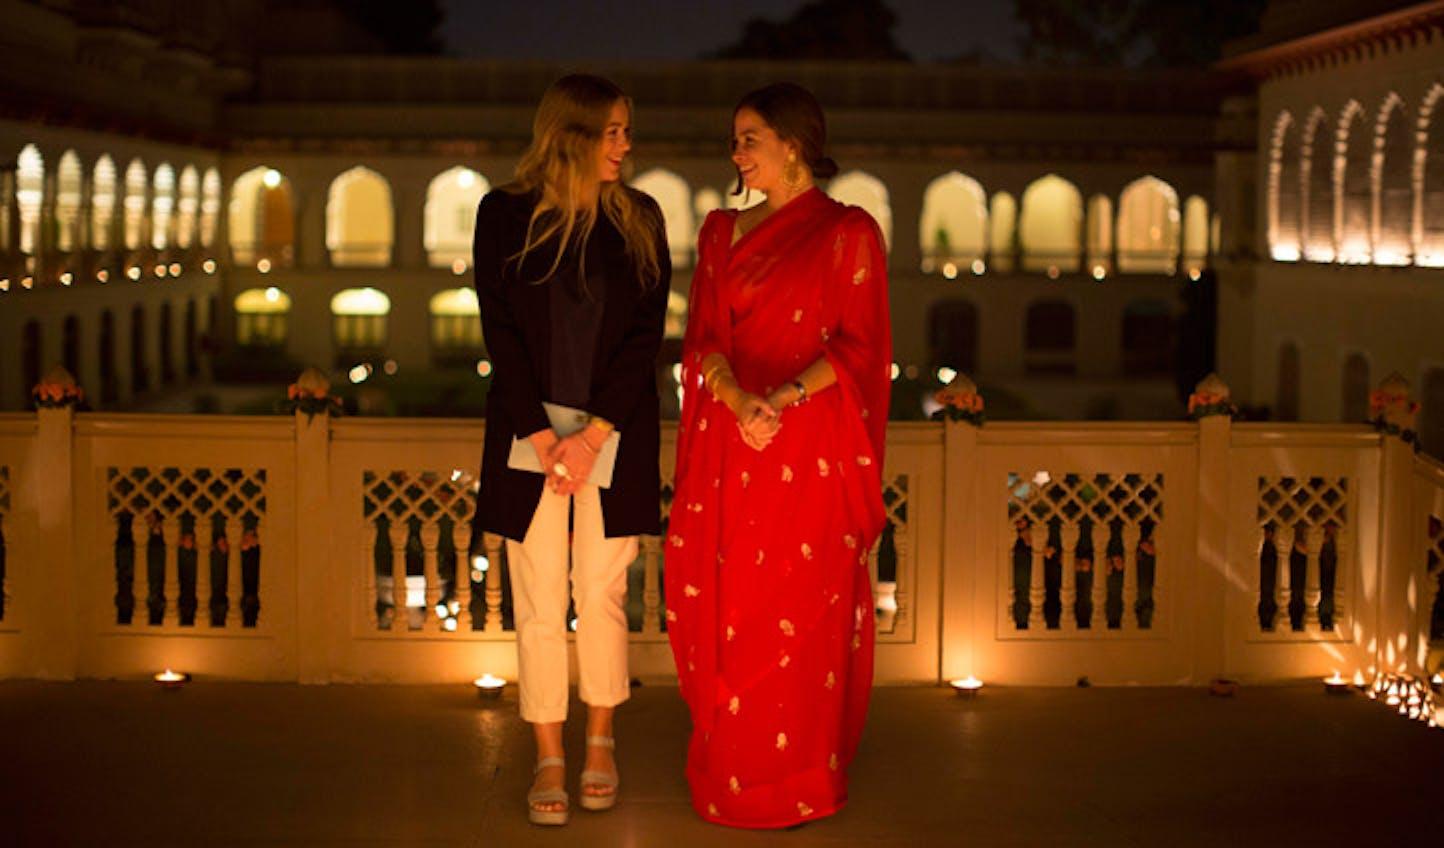 Serena visited India last year